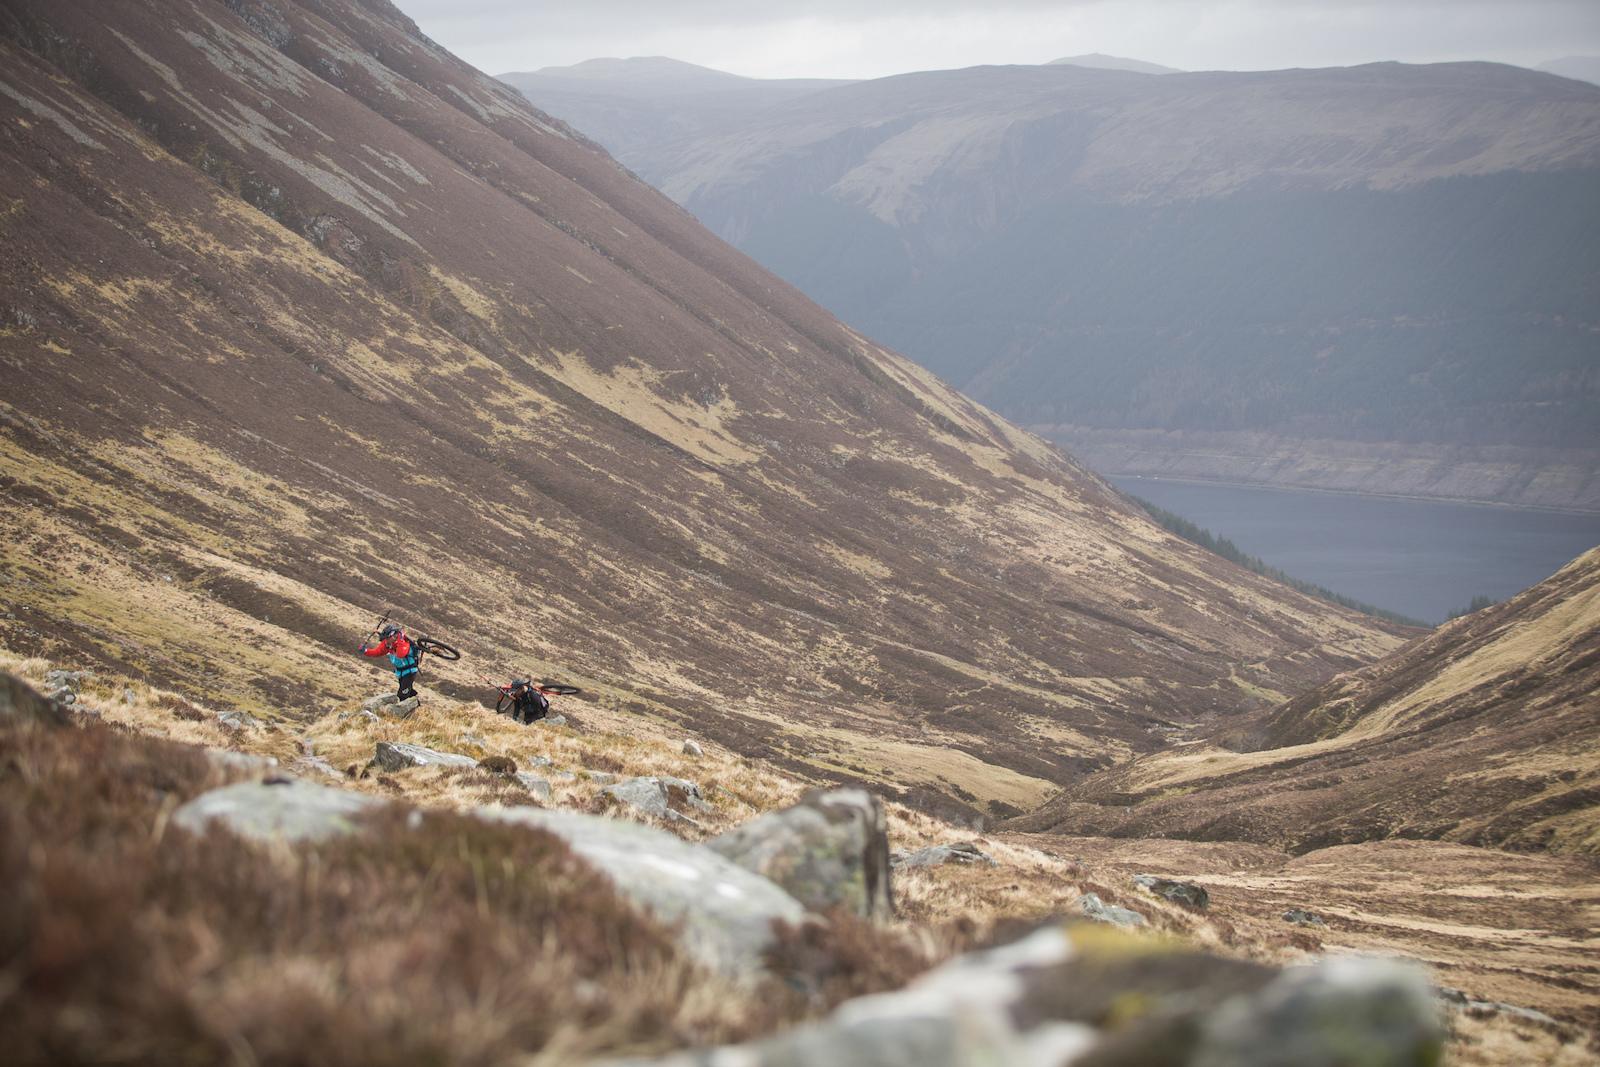 The Great Glen - The Hard Way